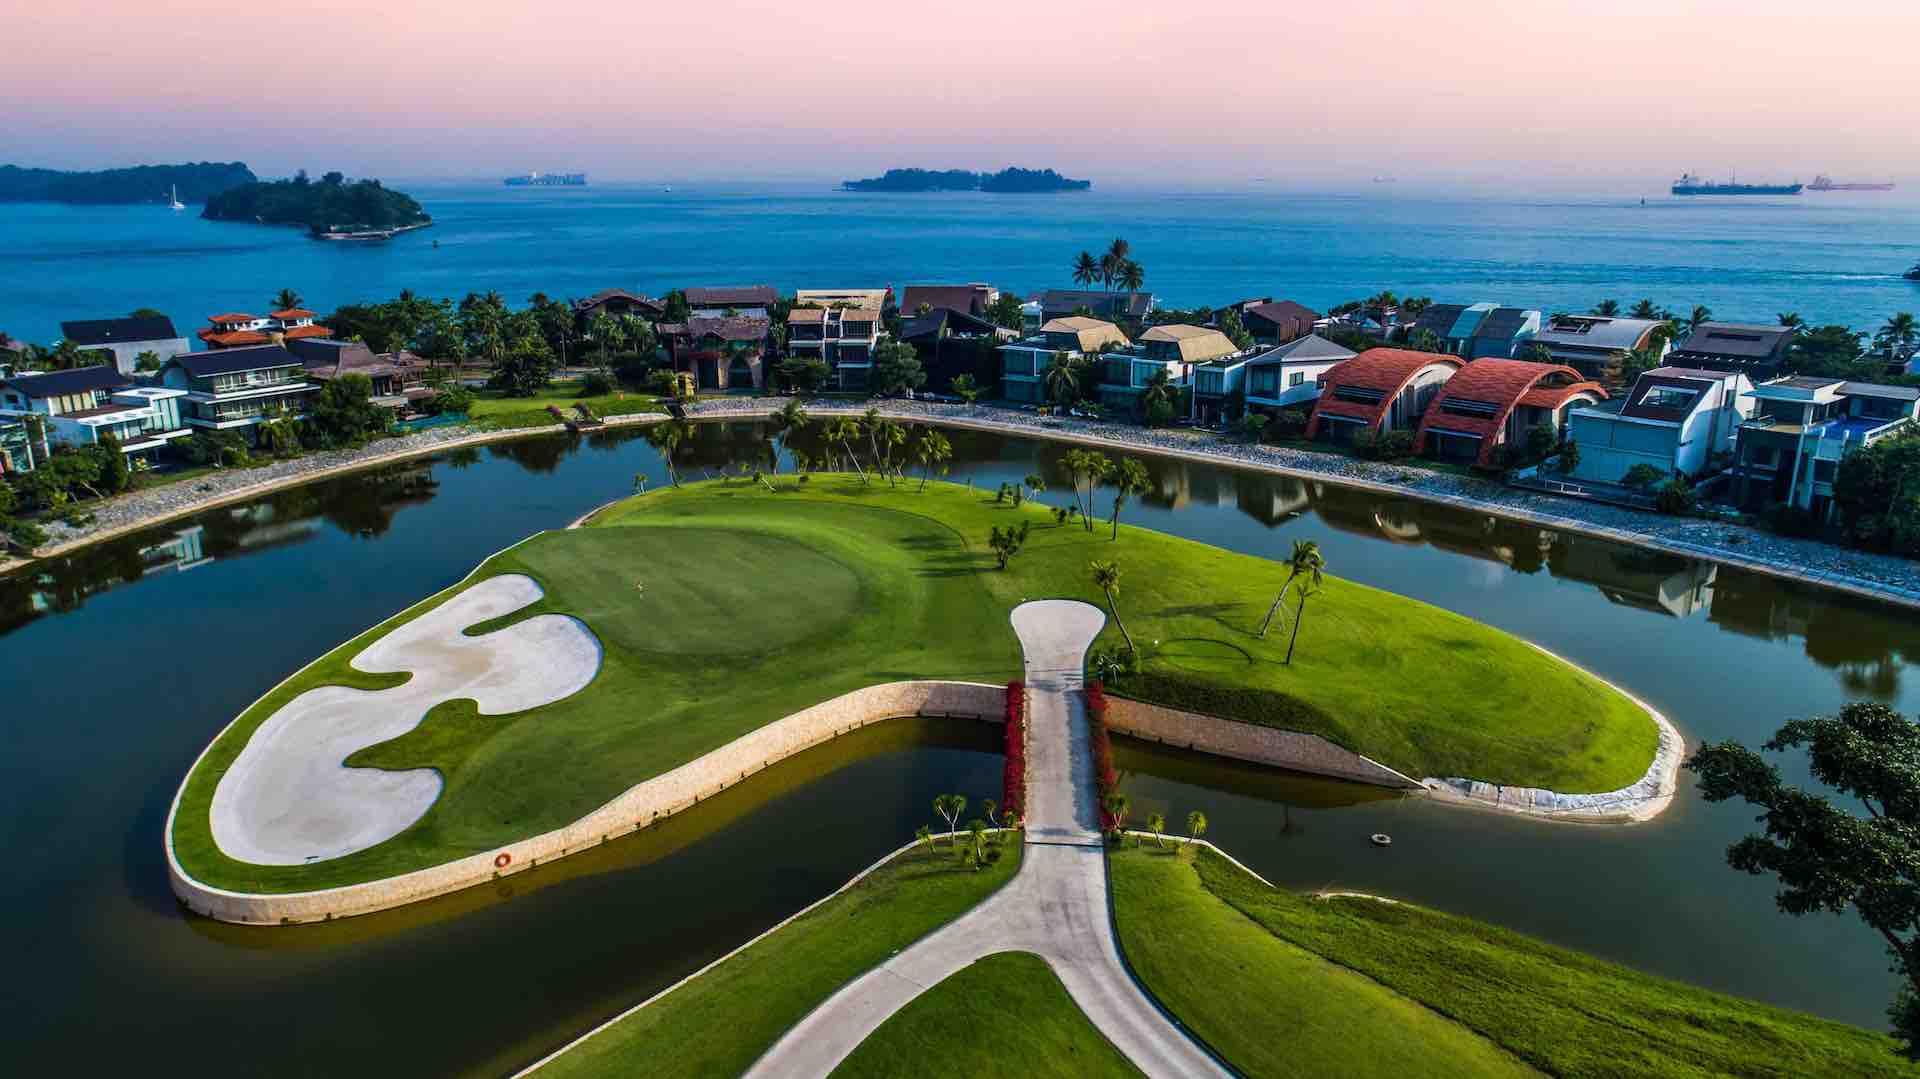 GolfPorn - it's Sentosa time